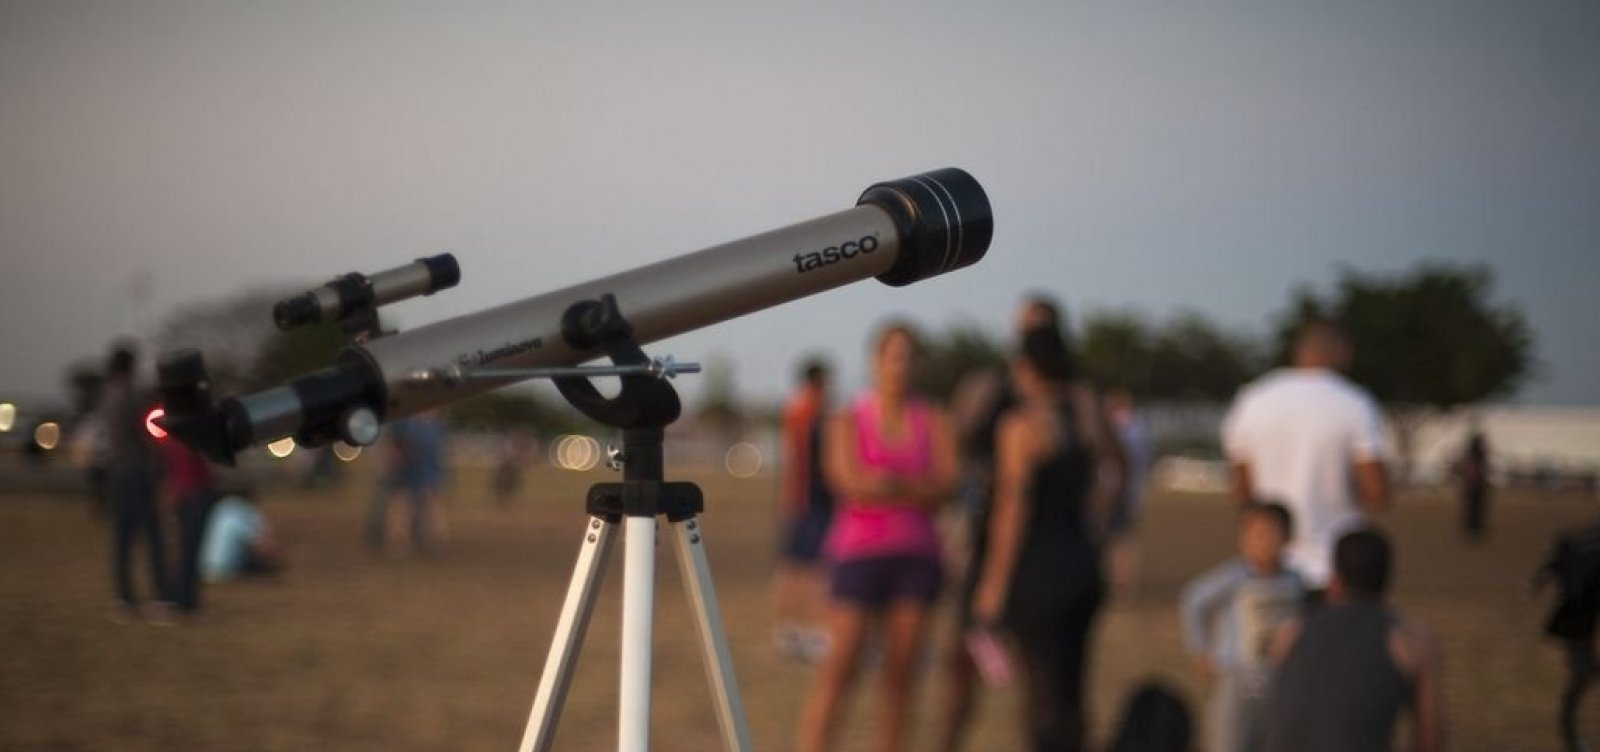 [Cerca de 800 mil alunos participam da Olimpíada Brasileira de Astronomia]